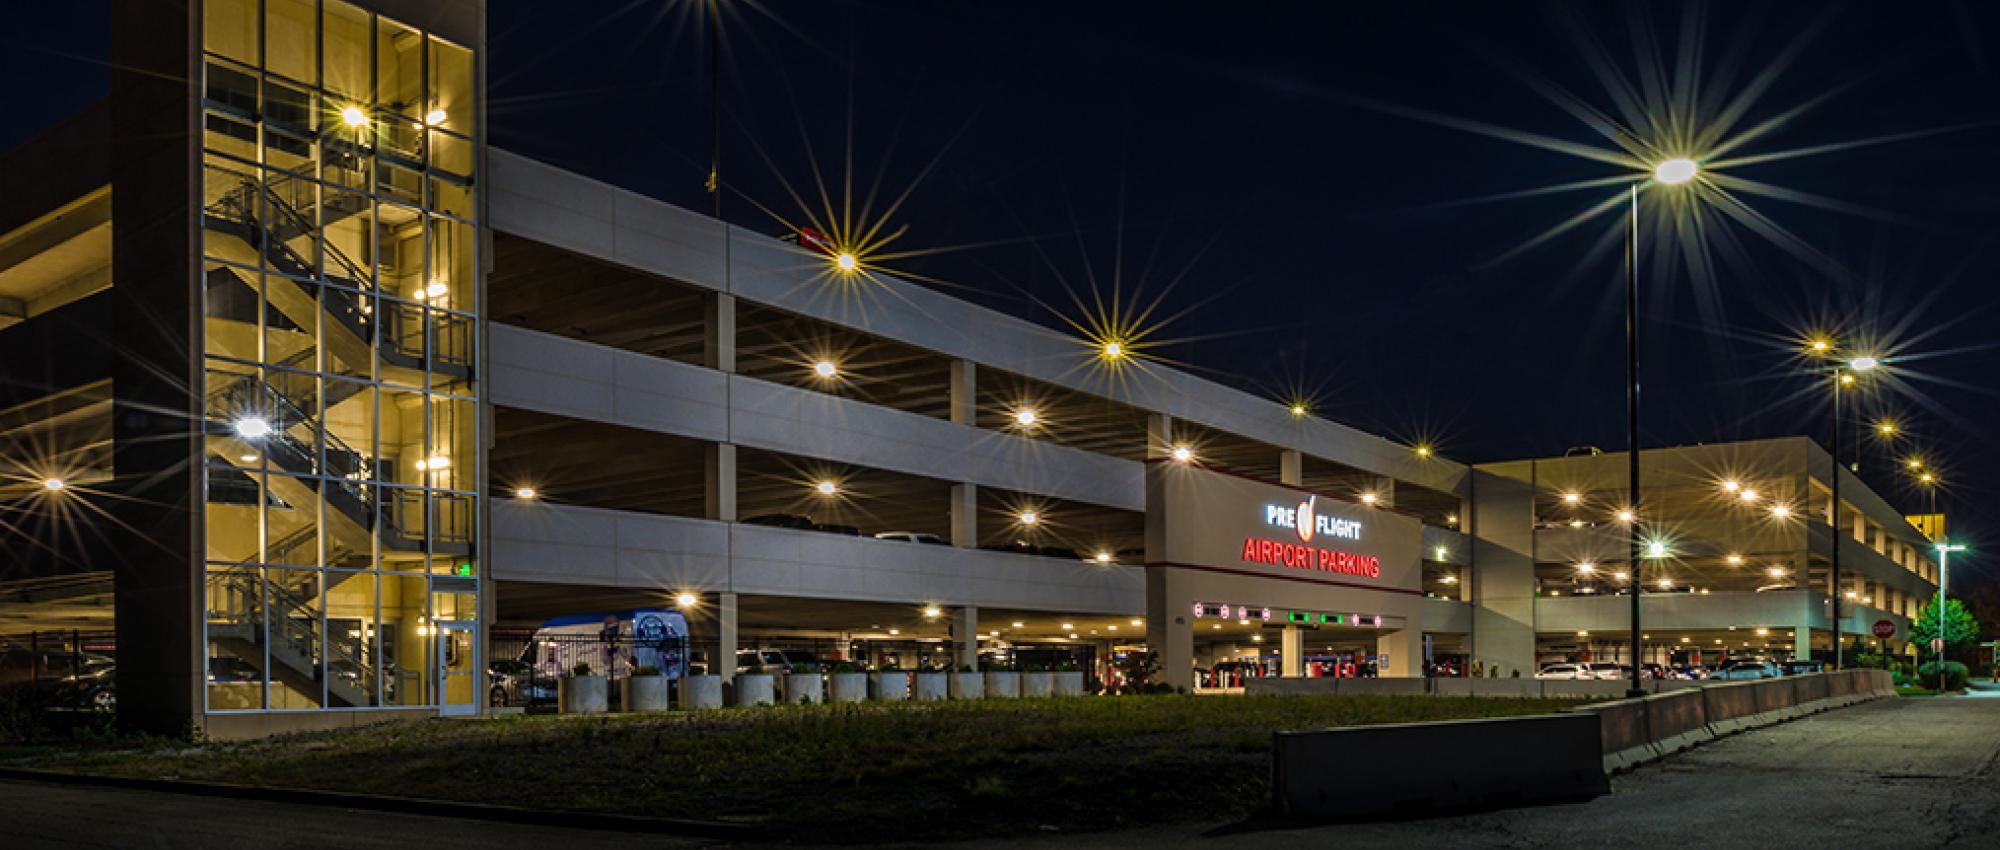 Preflight Airport Deck Atmi Precast